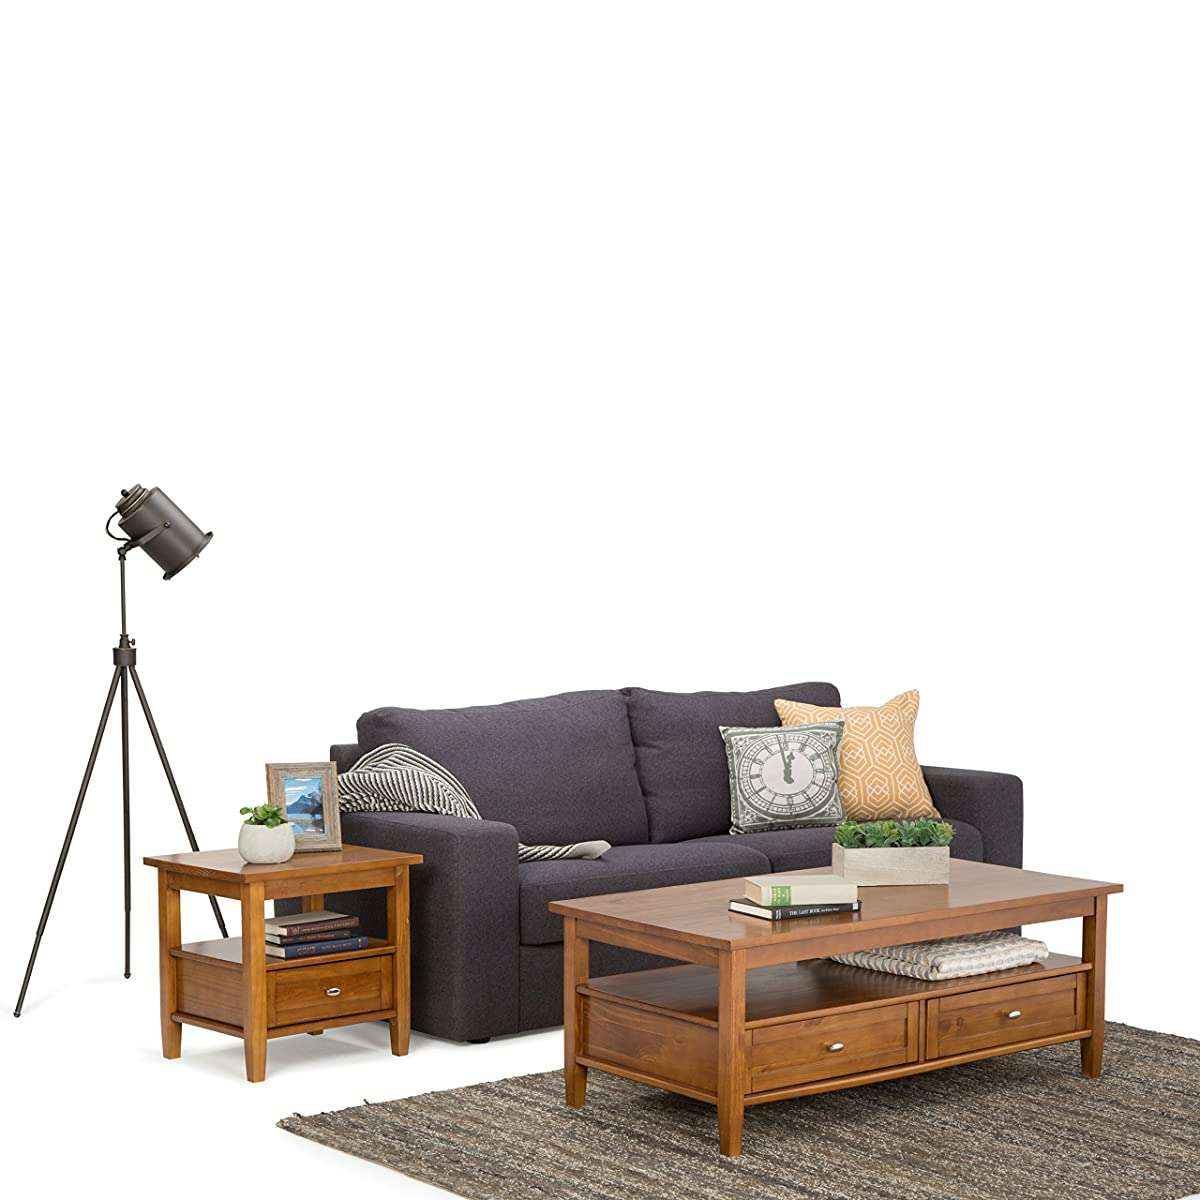 Simpli Home Warm Shaker Coffee Table, Honey Brown